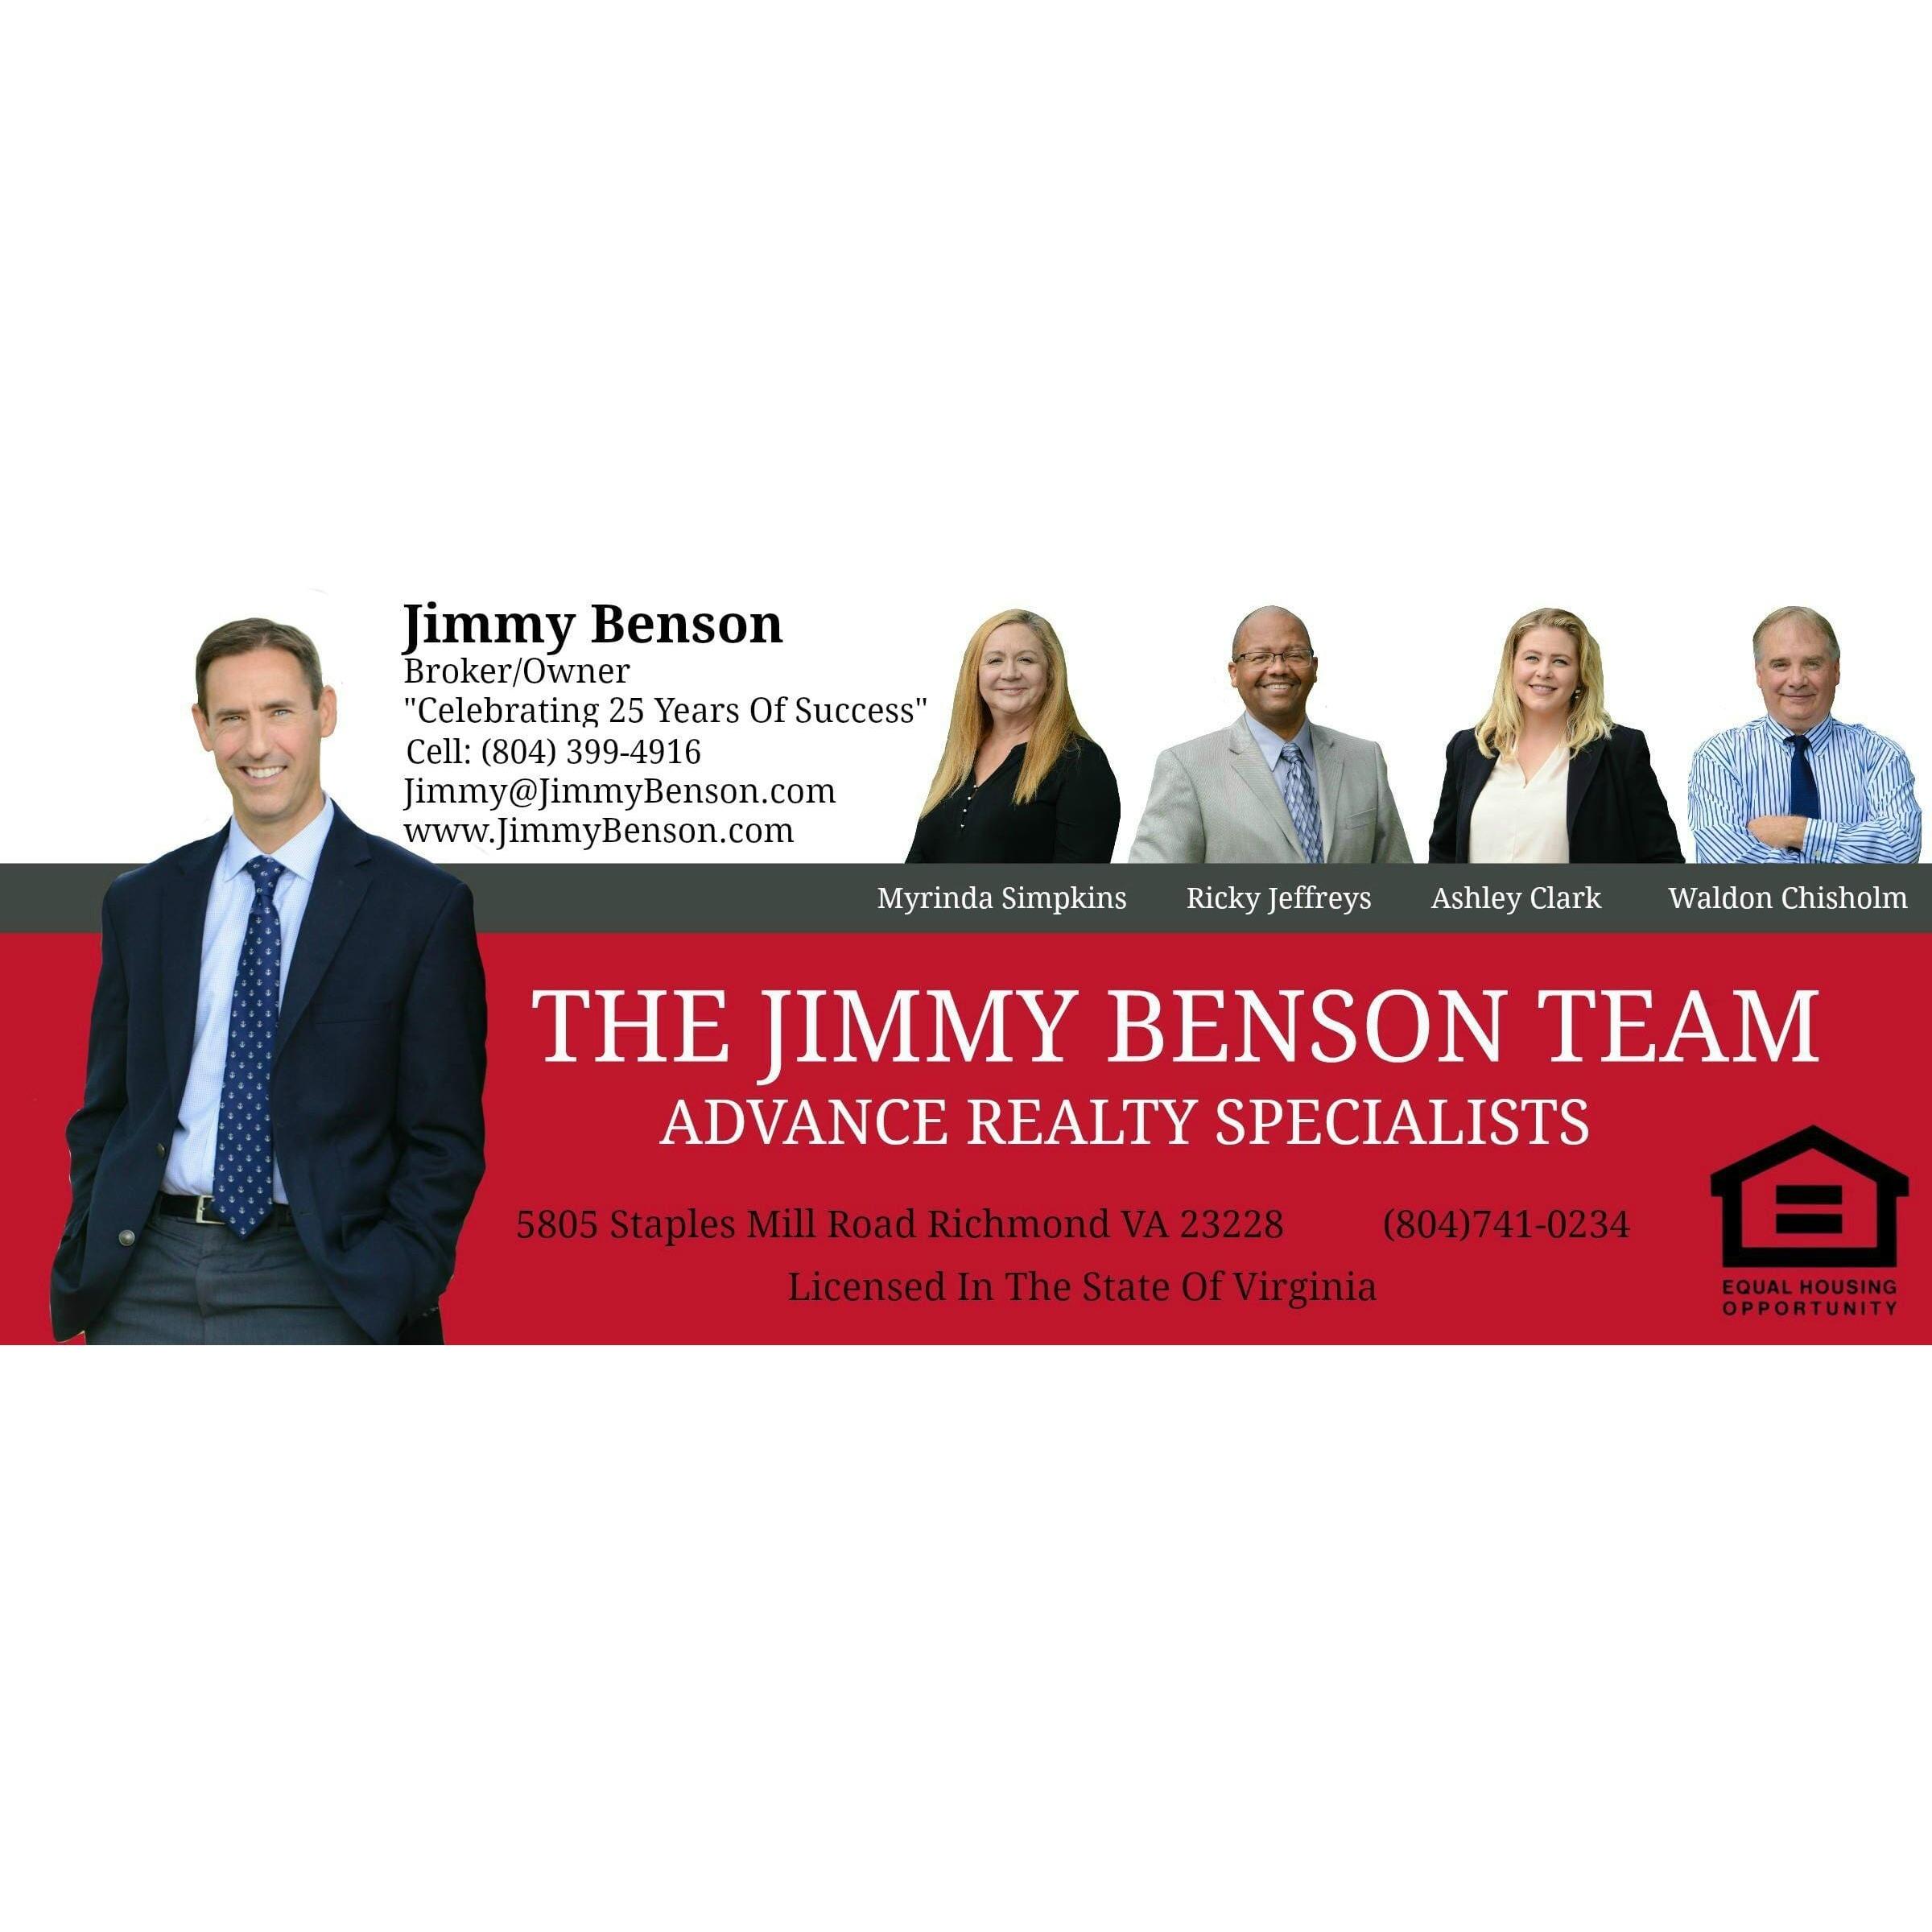 Jimmy Benson image 6